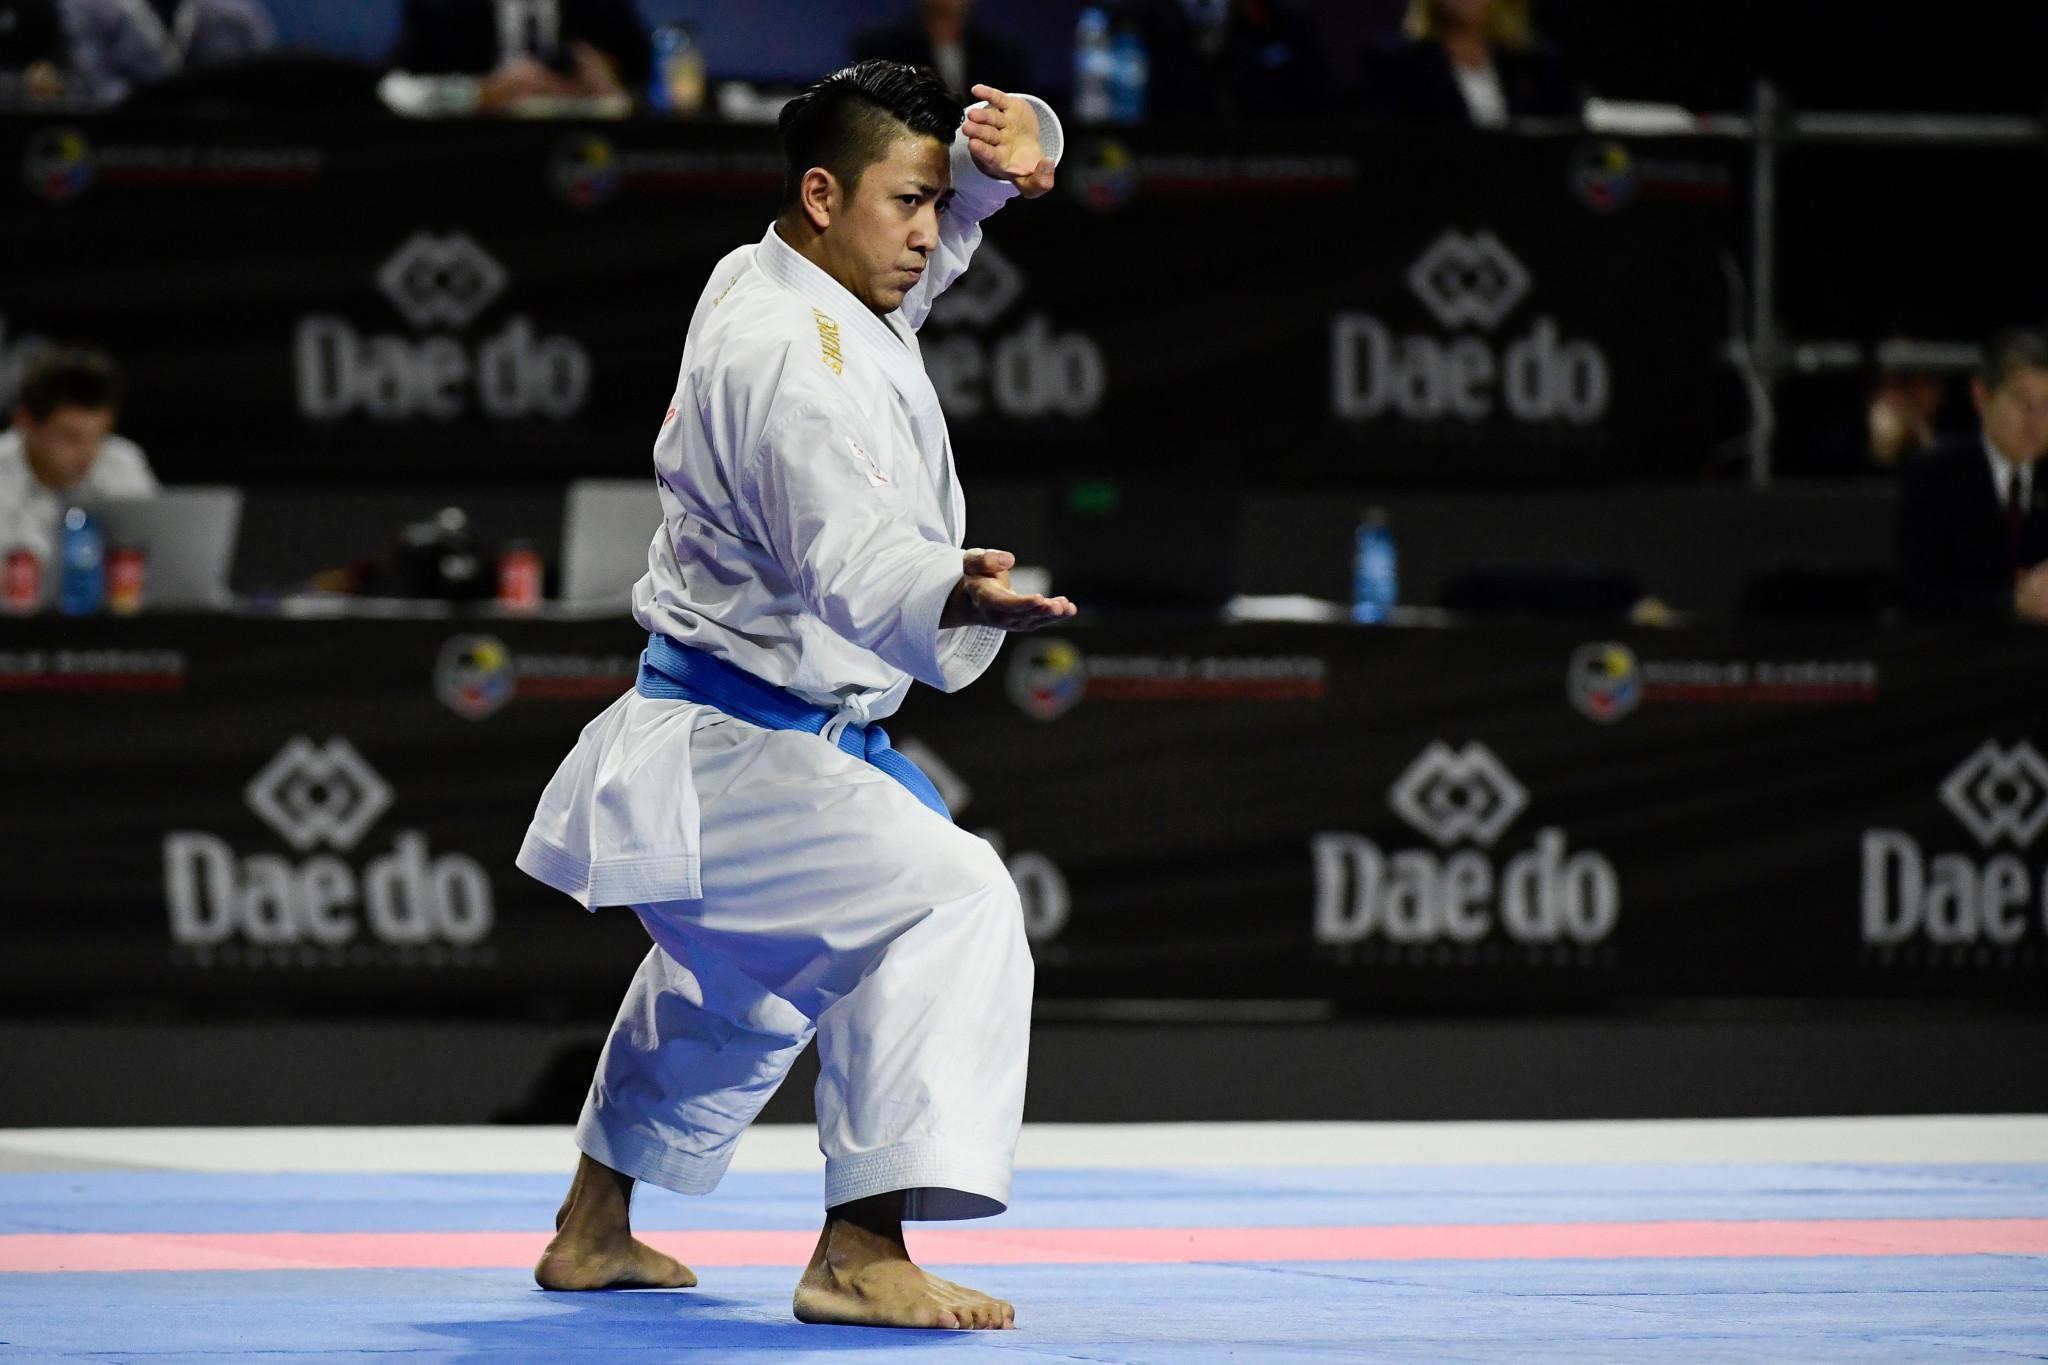 Sanchez makes history as Kiyuna extends reign of kata dominance at Karate World Championships